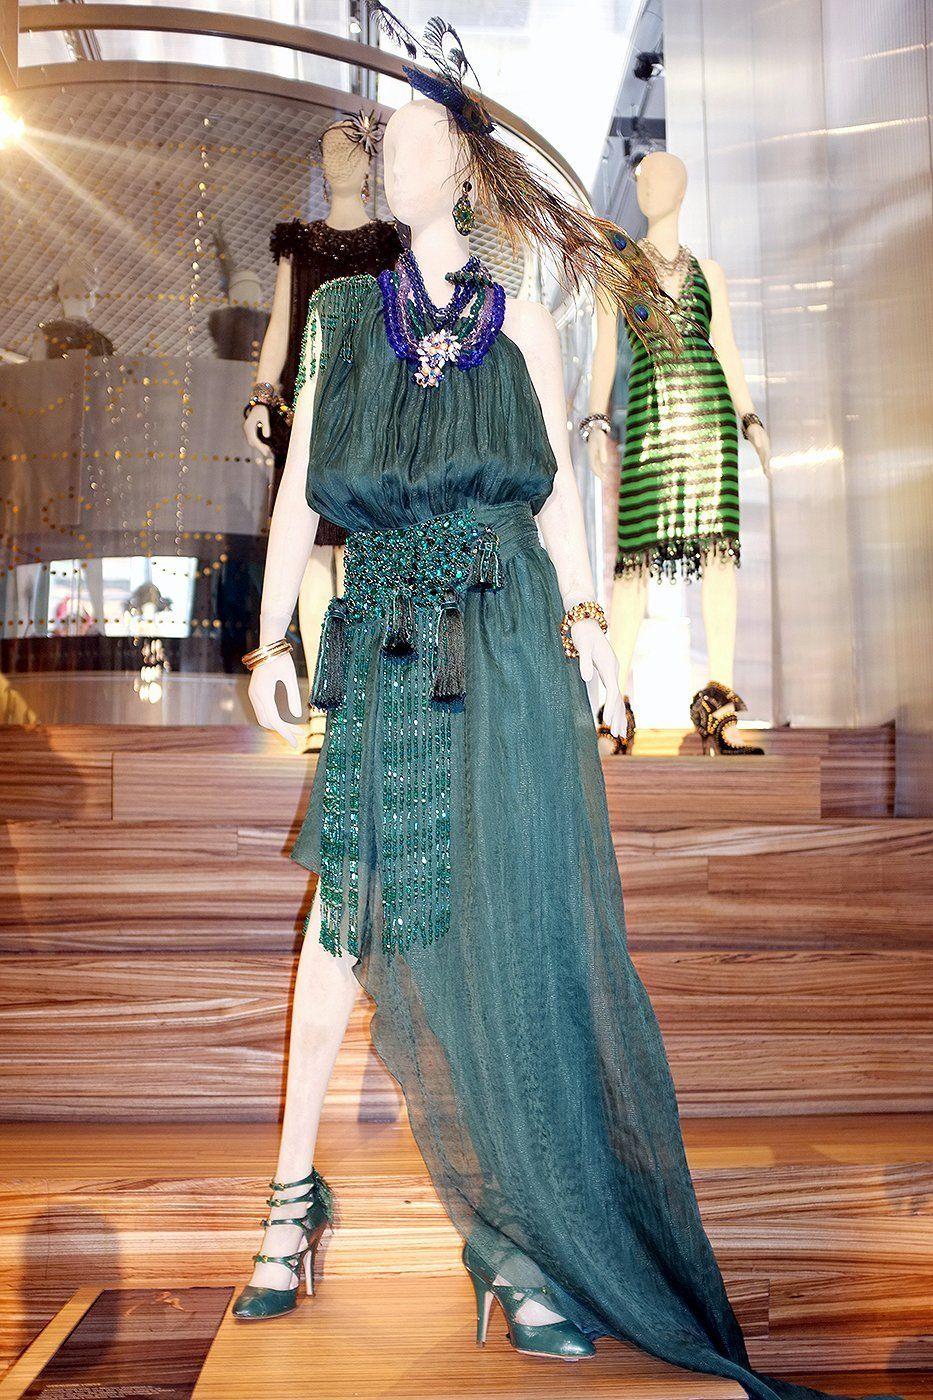 Catherine Martin-Miuccia Prada Dress The Great Gatsby 2013 ...